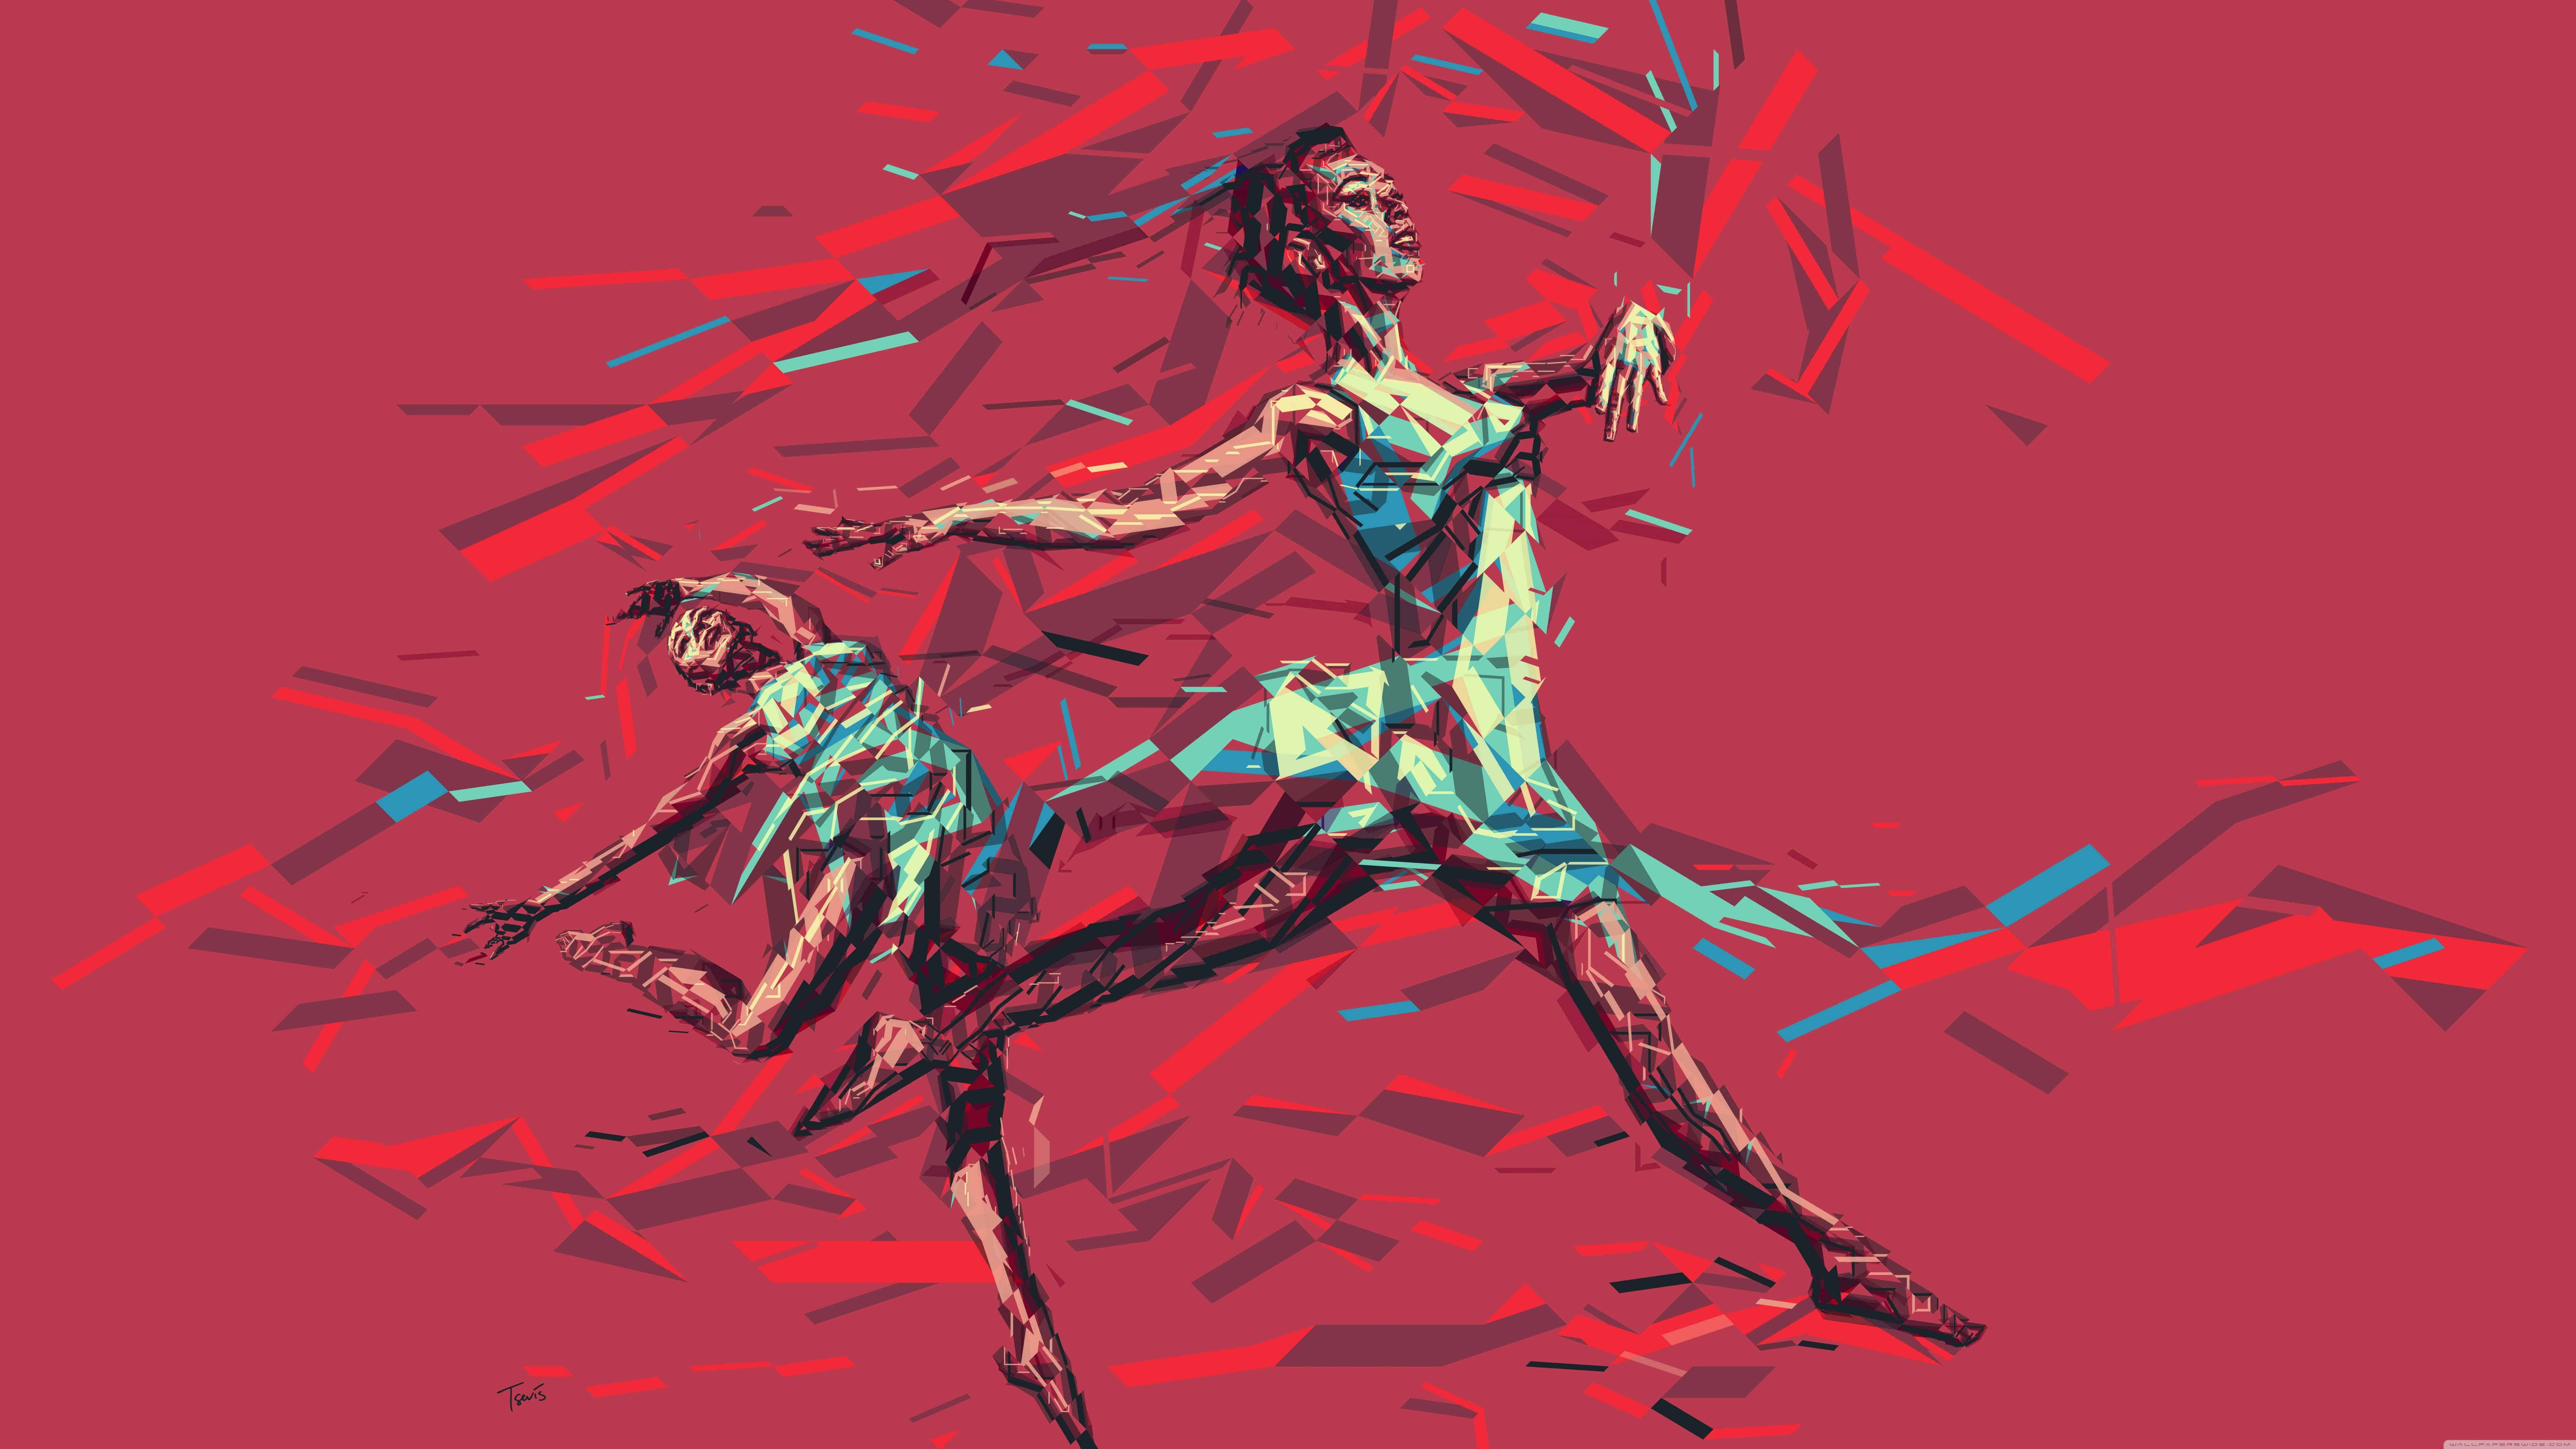 ballerina dancing uhd 8k wallpaper